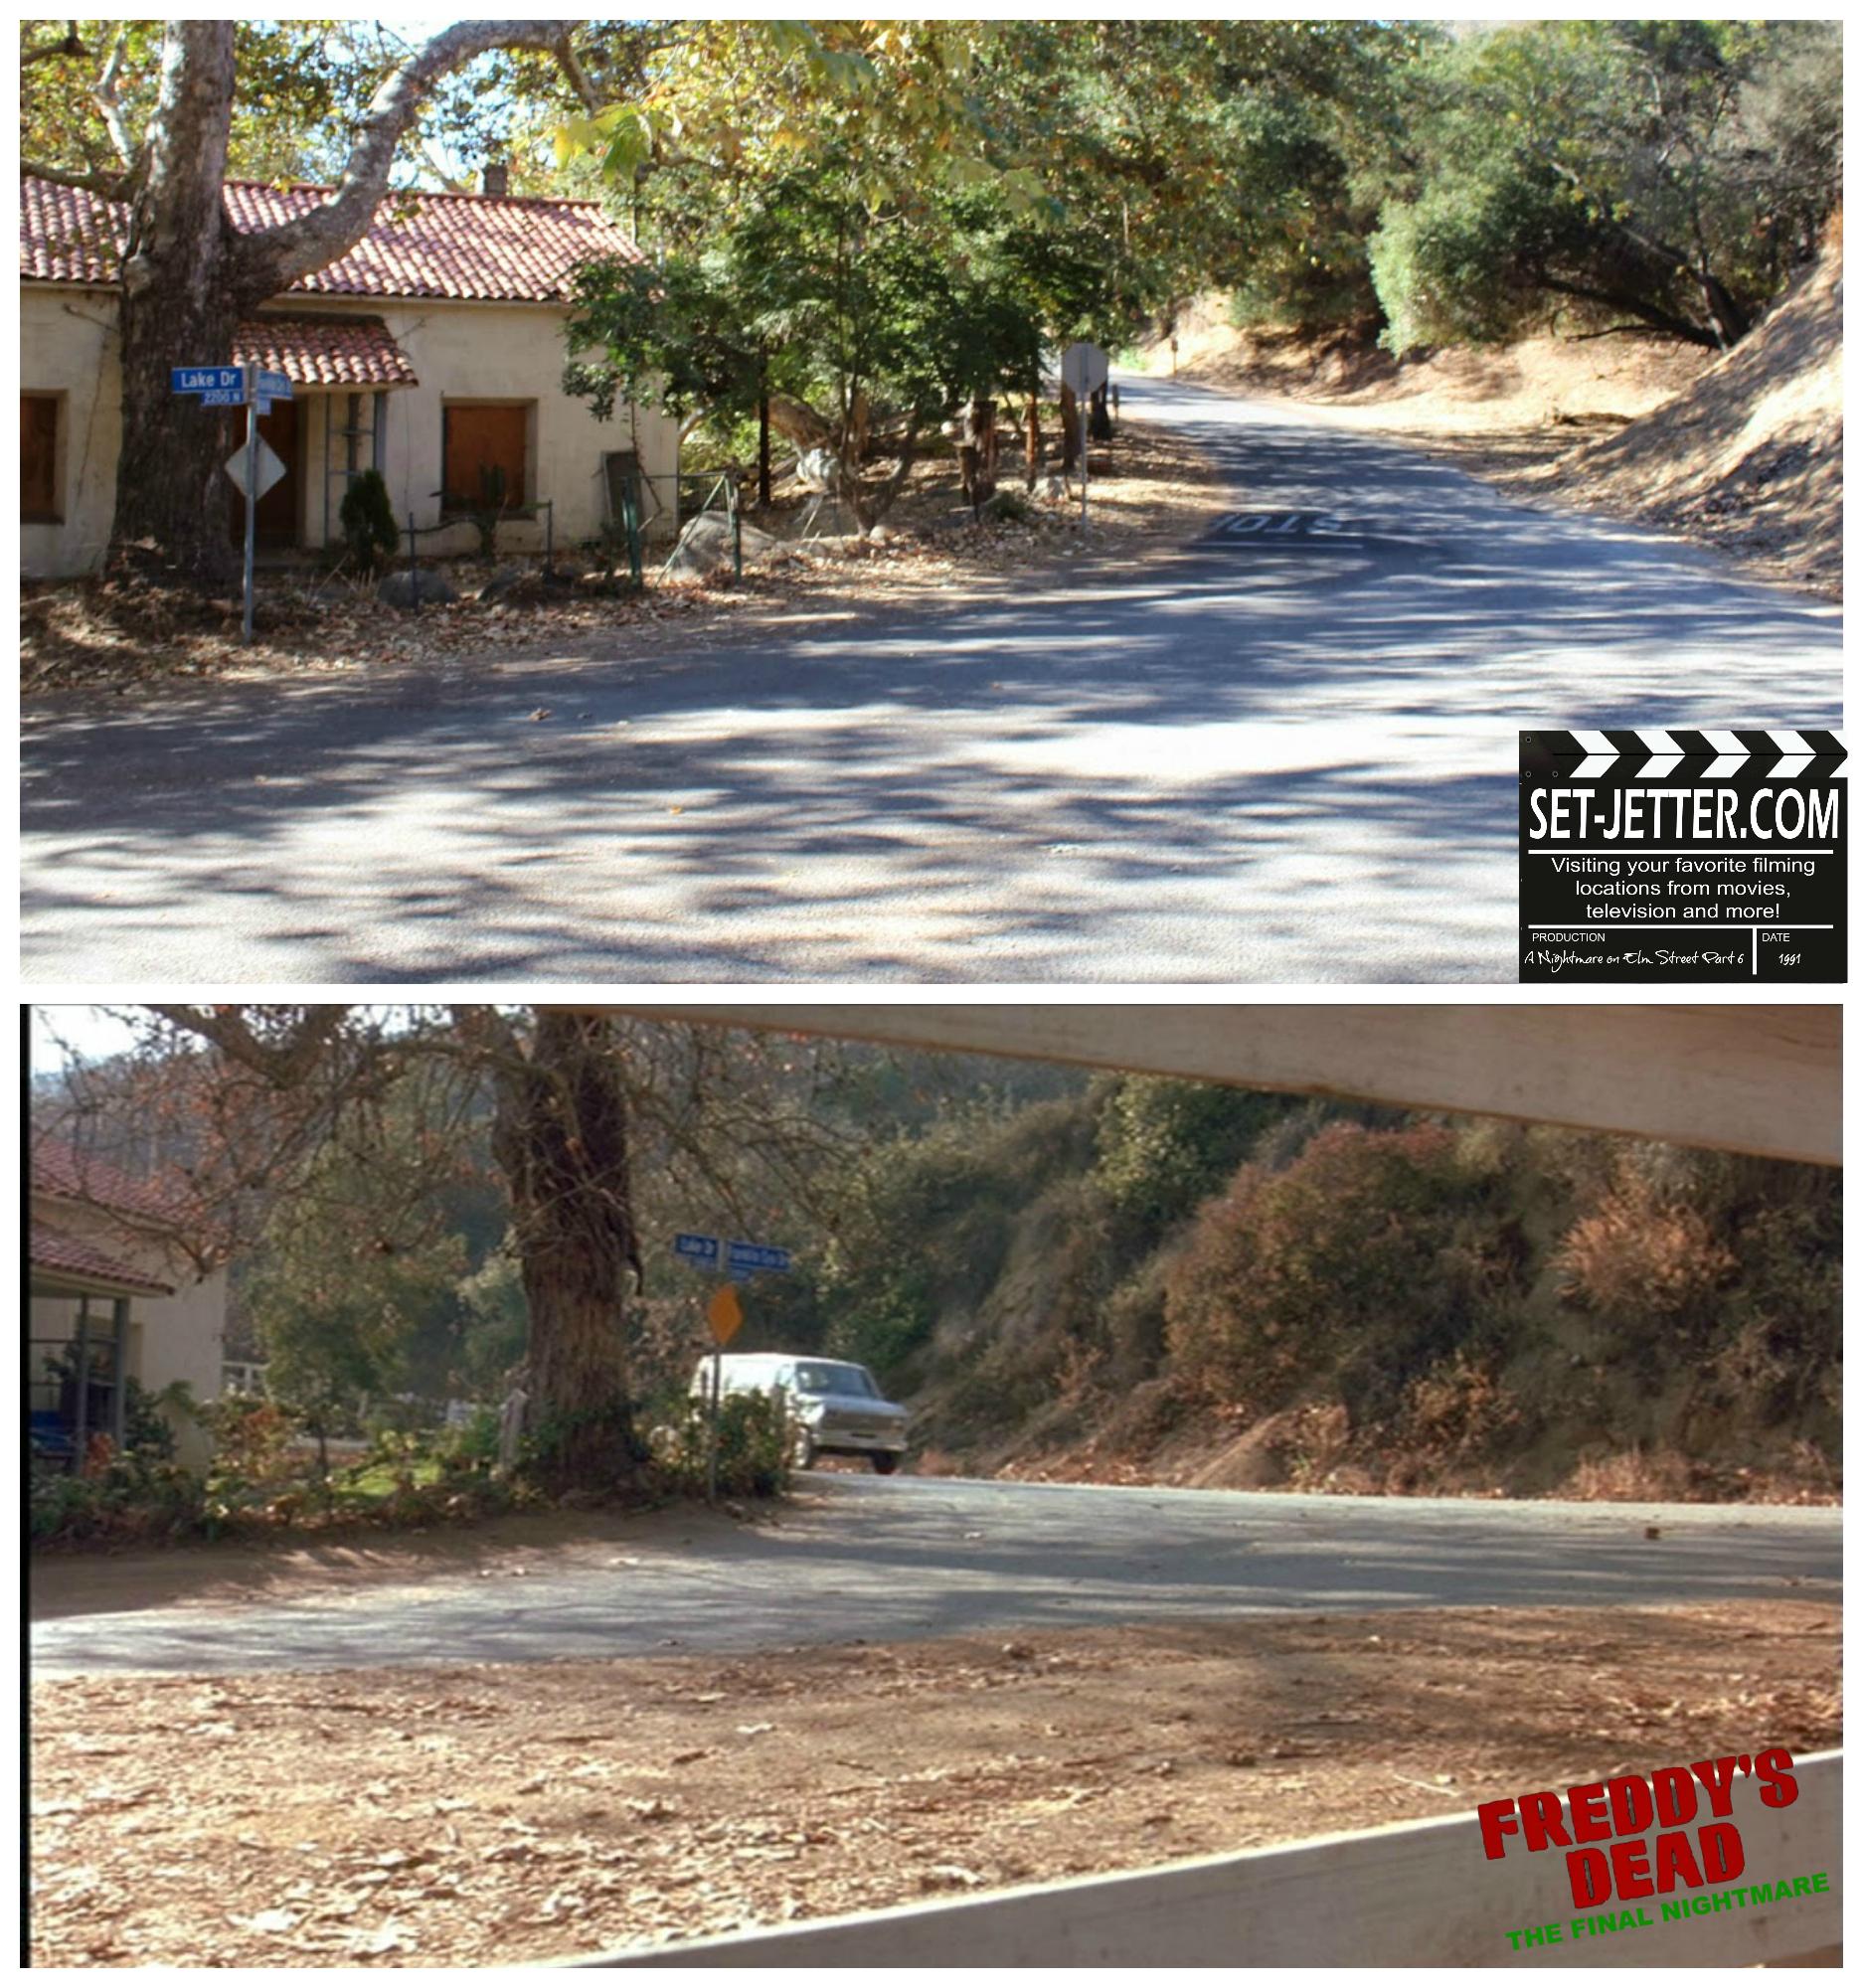 Nightmare on Elm Street Part 6 comparison 07.jpg